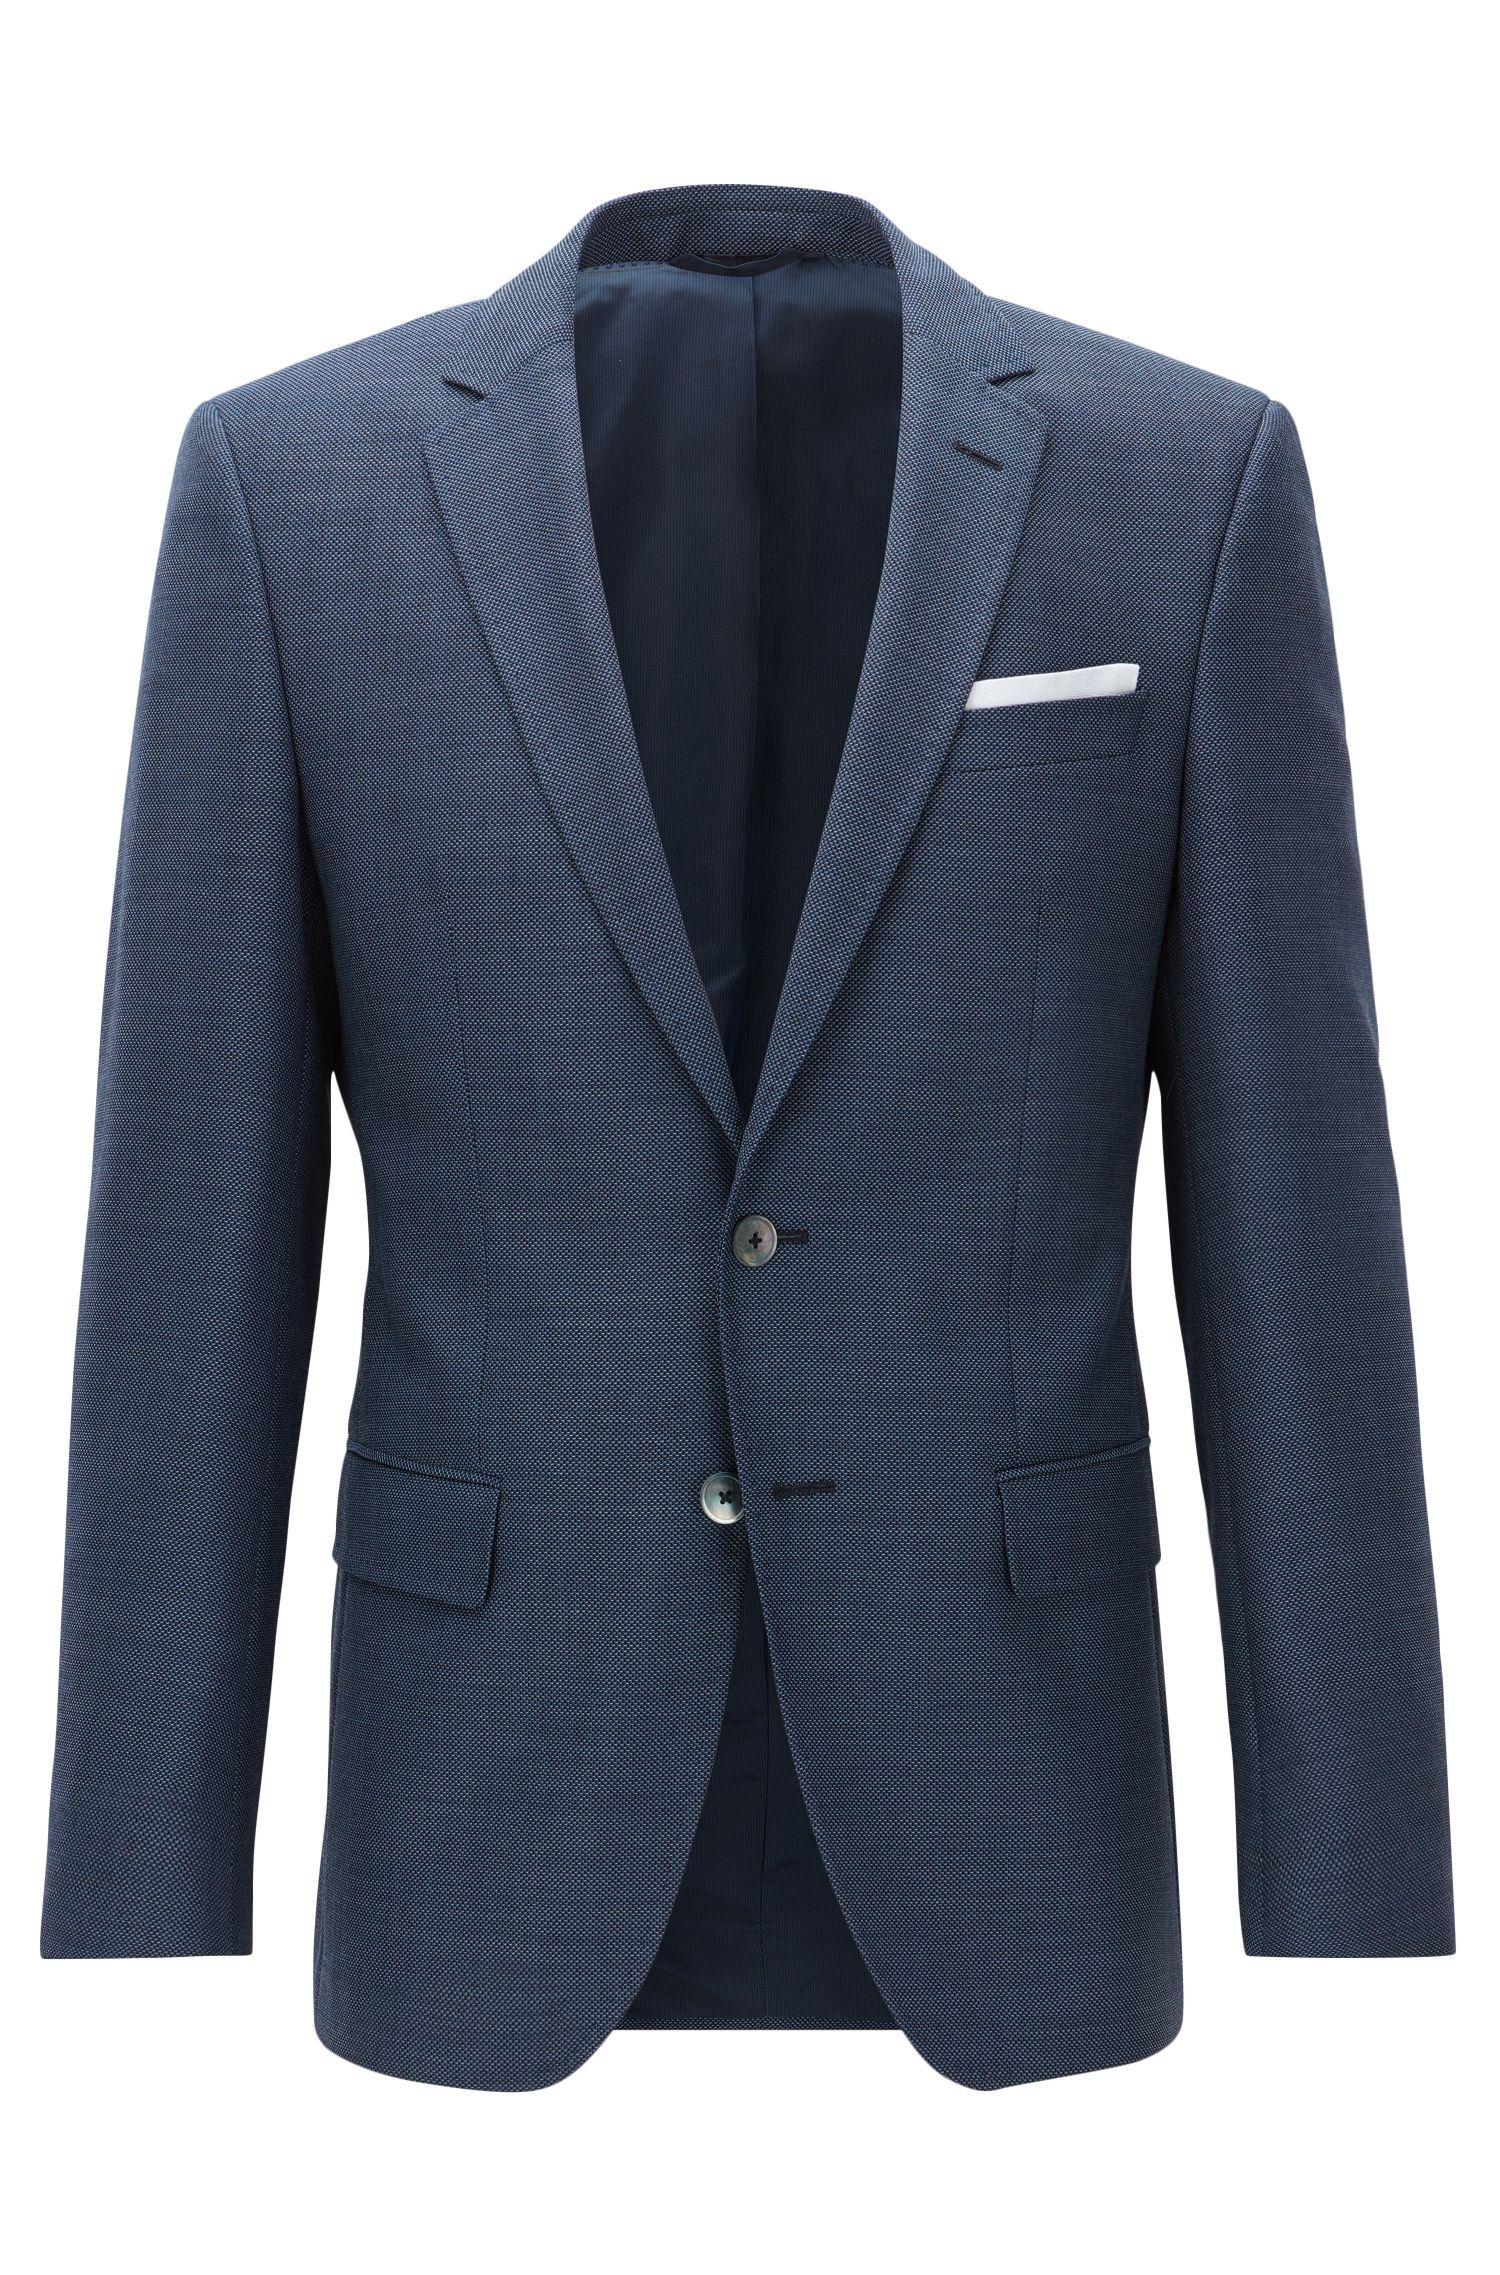 Slim-fit patterned virgin-wool jacket with pocket square